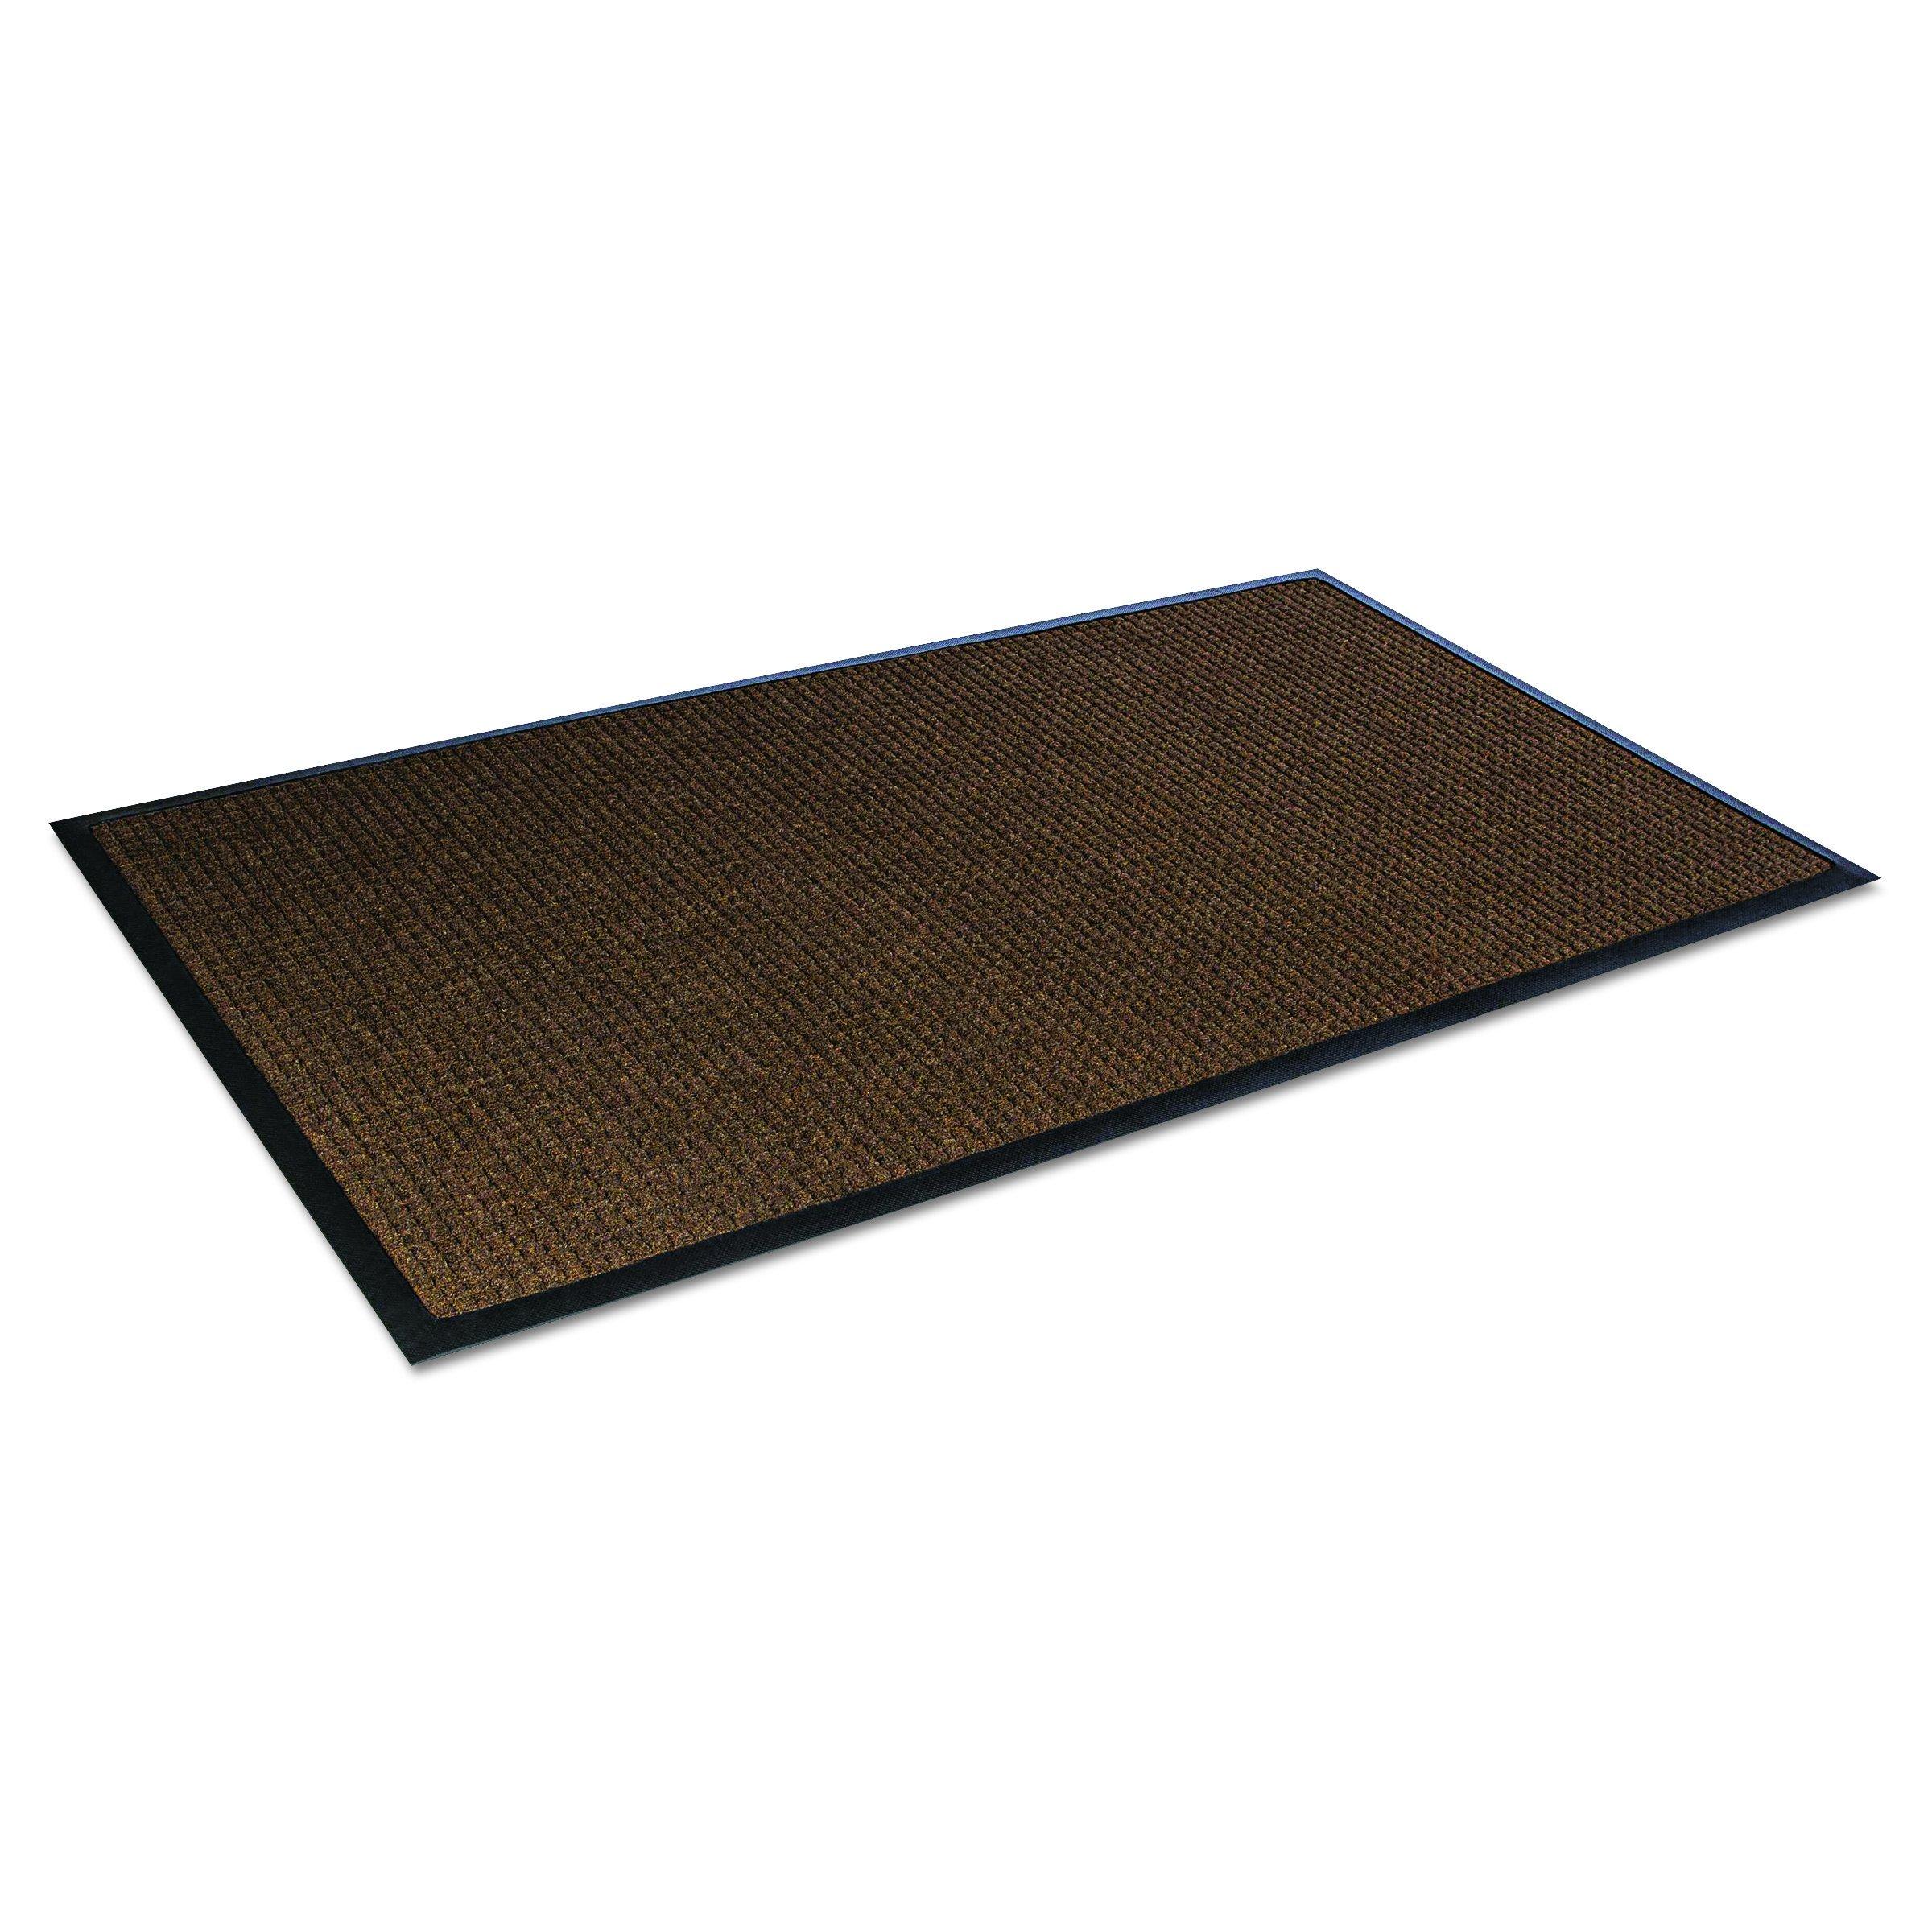 Crown Super-Soaker Wiper Mat with Gripper Bottom, Polypropylene, 34 by 119 Inches, Dark Brown (SSR310DB)